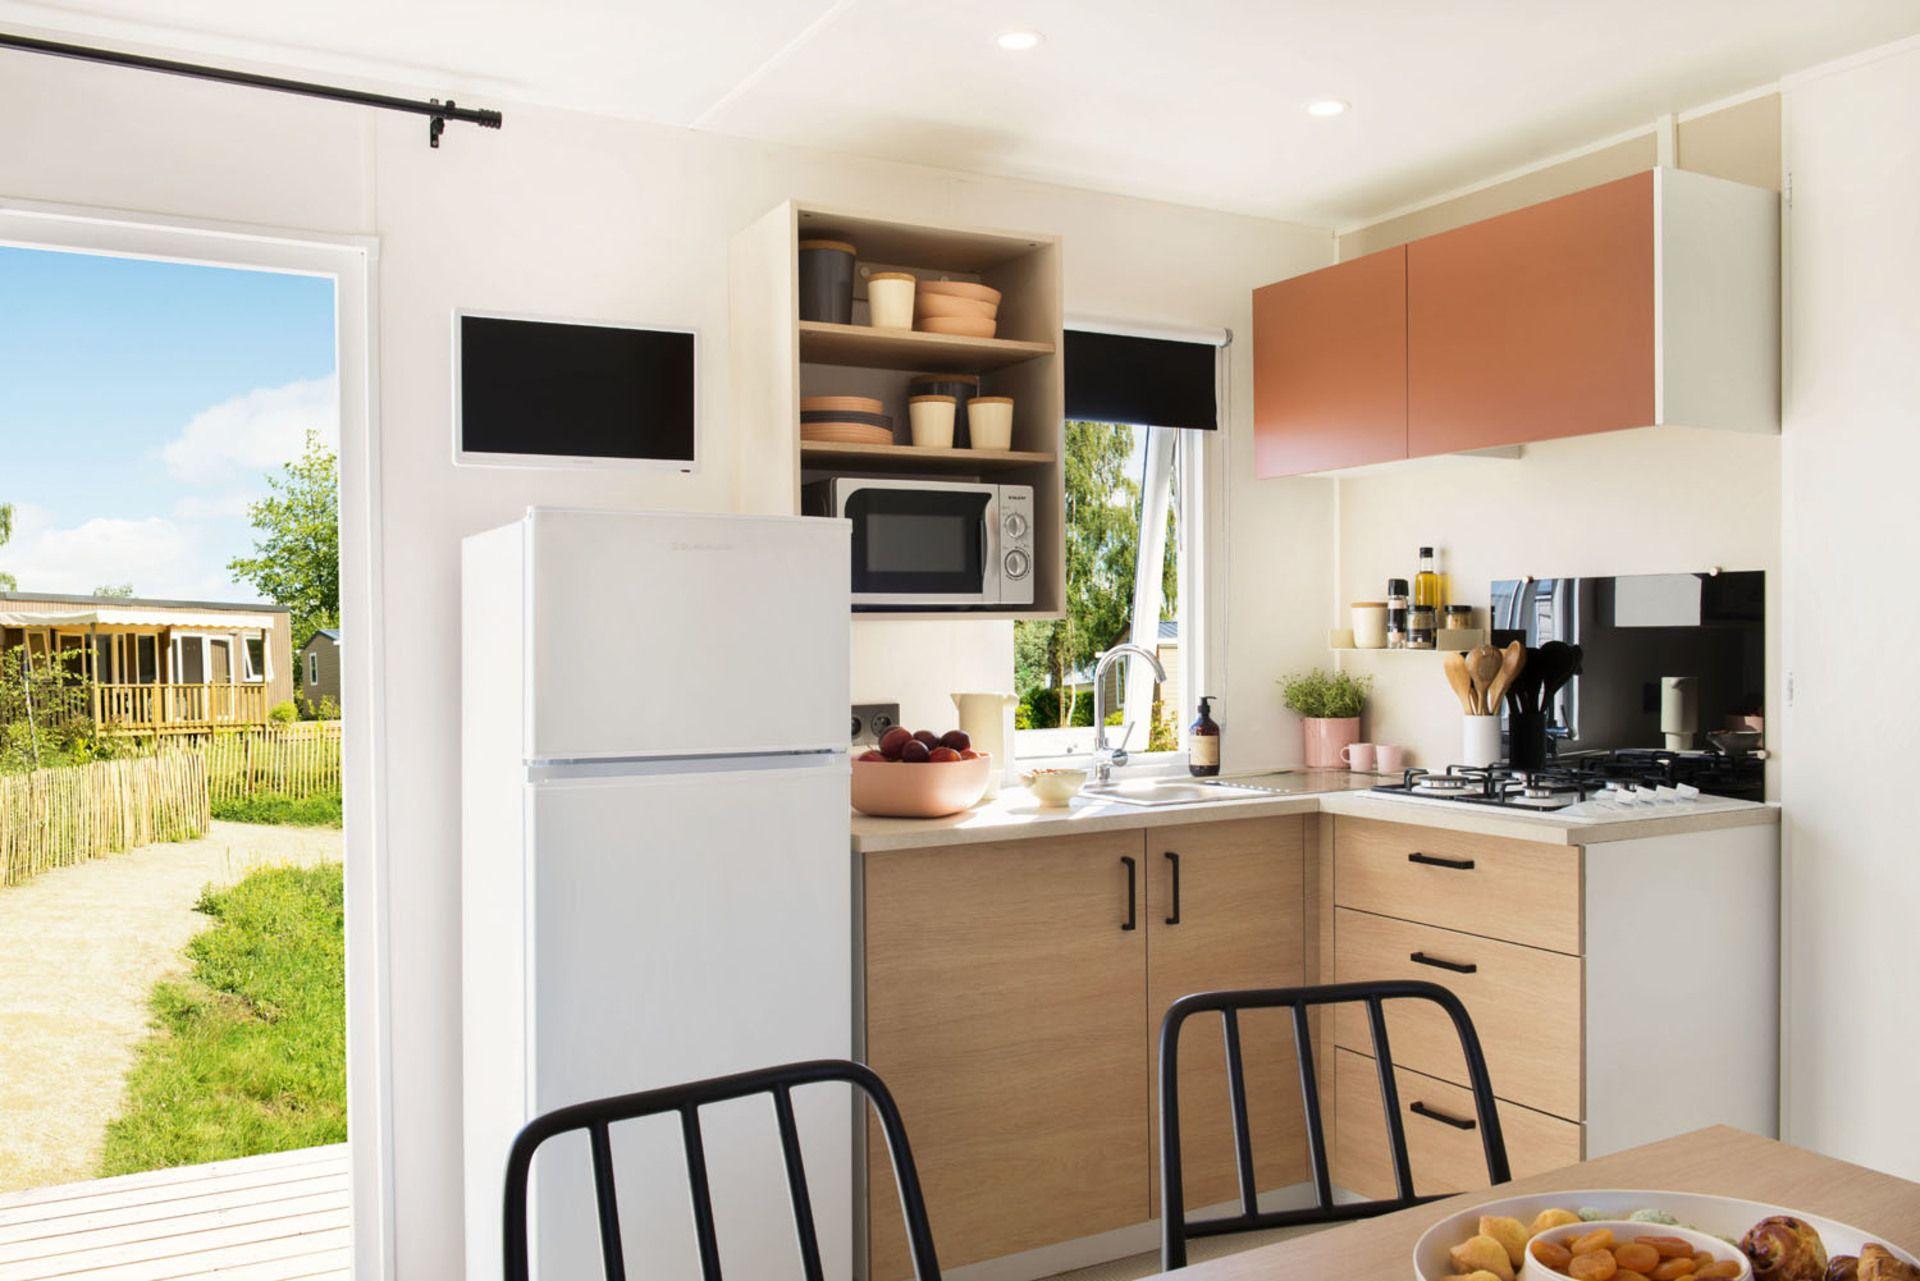 IRM SUPER TITANIA 3 - 2022 - Mobil home Neuf - Zen Mobil homes